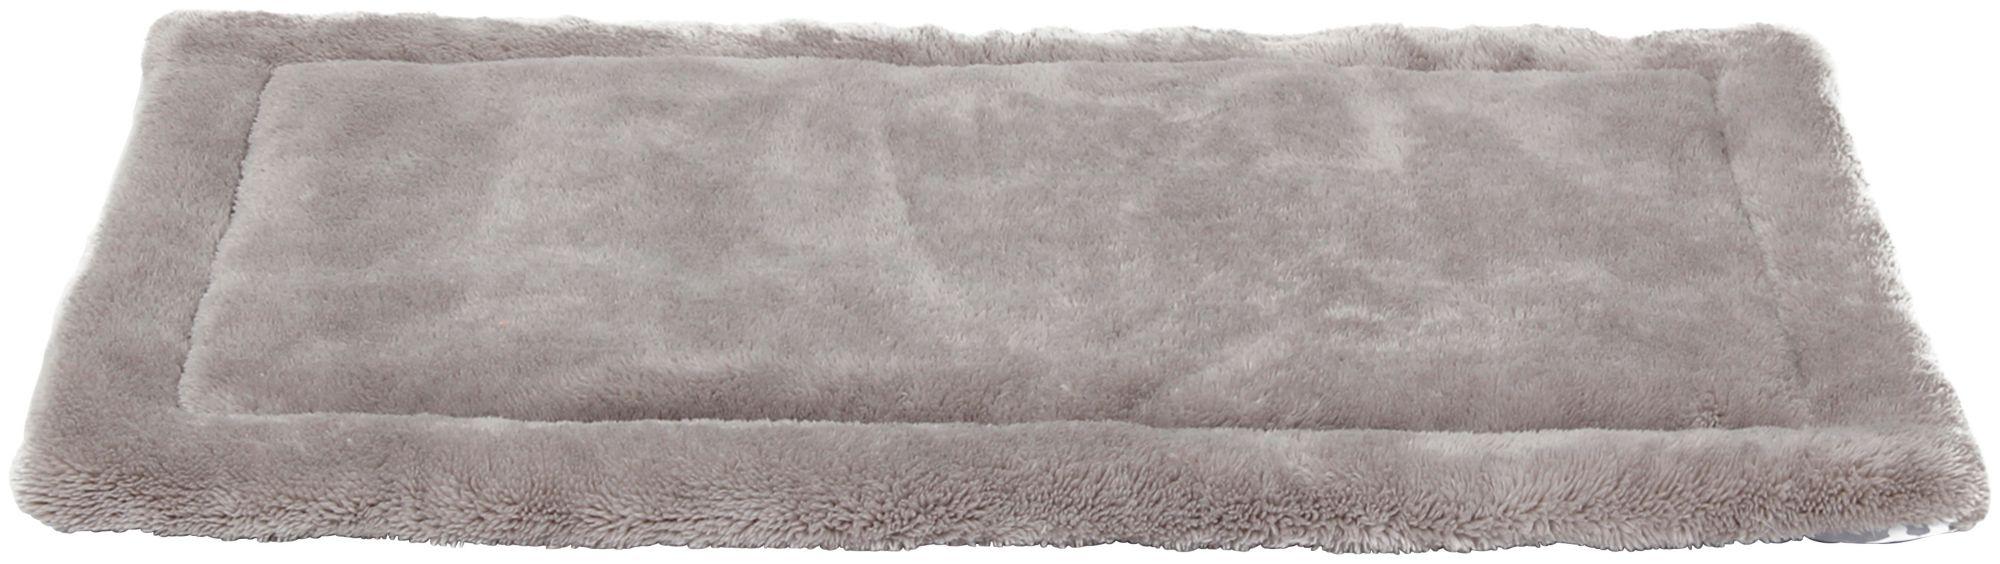 HEIM  Hunde-Decke »Flower«, Fleece, Pastellfarben-Grau